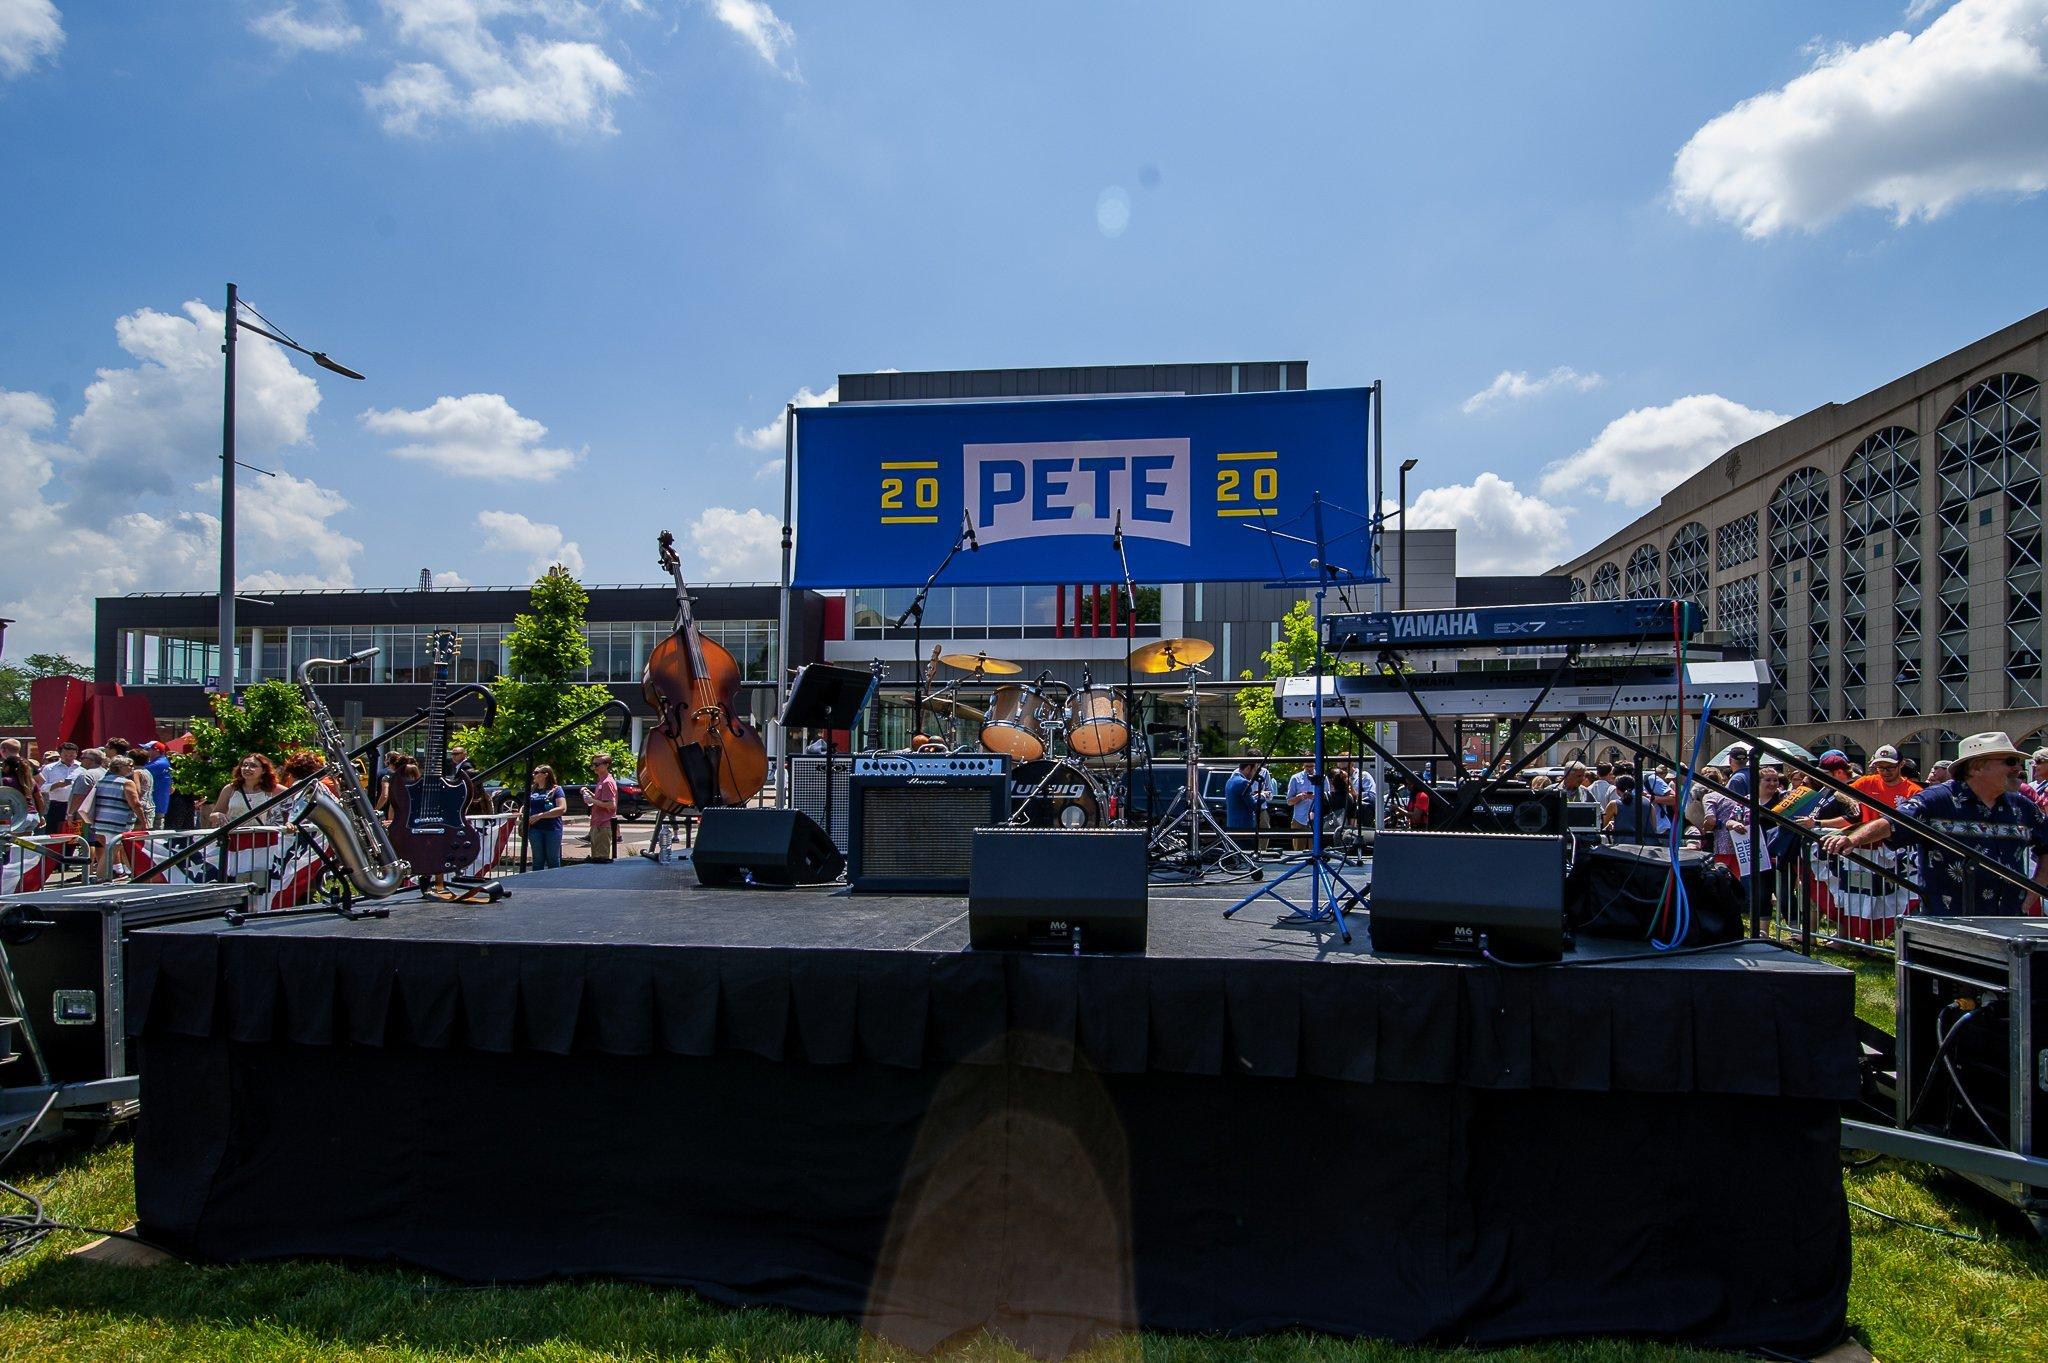 Pete 2020 sign at a Pete Buttigieg campaign stop in Cedar Rapids, Iowa